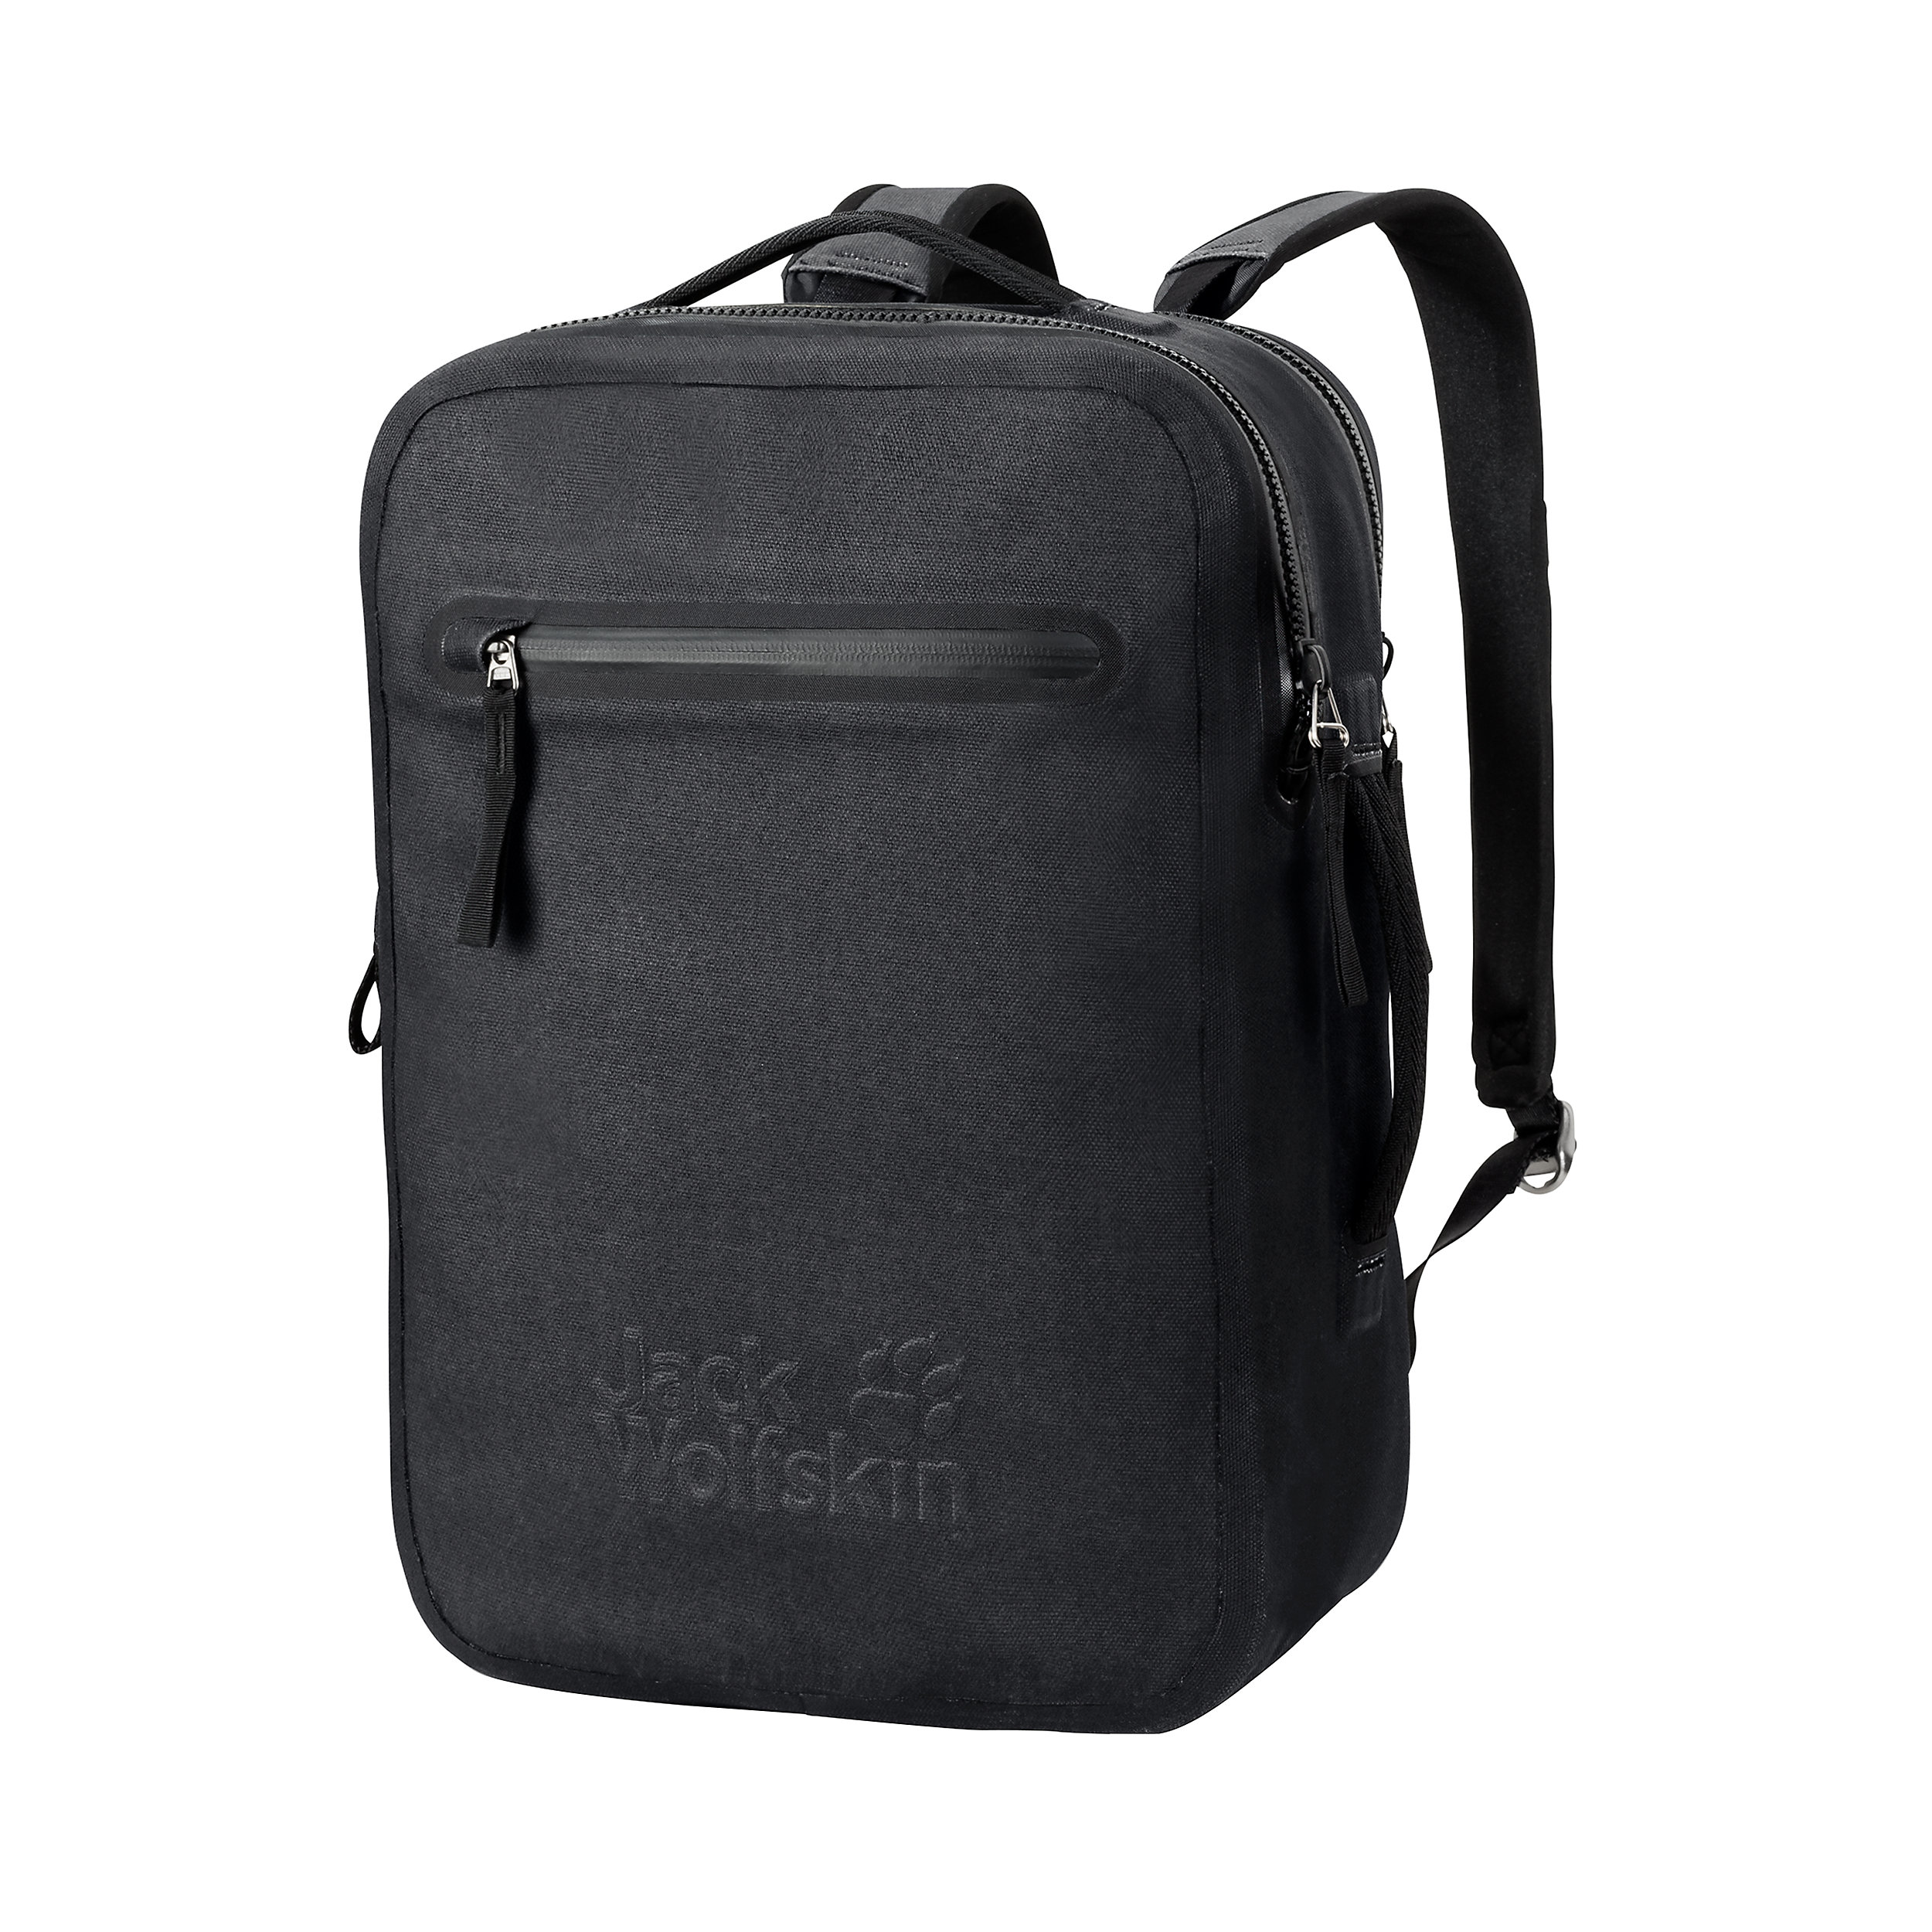 "Backpack Boxcar 20 10"" Hermetic Series M"